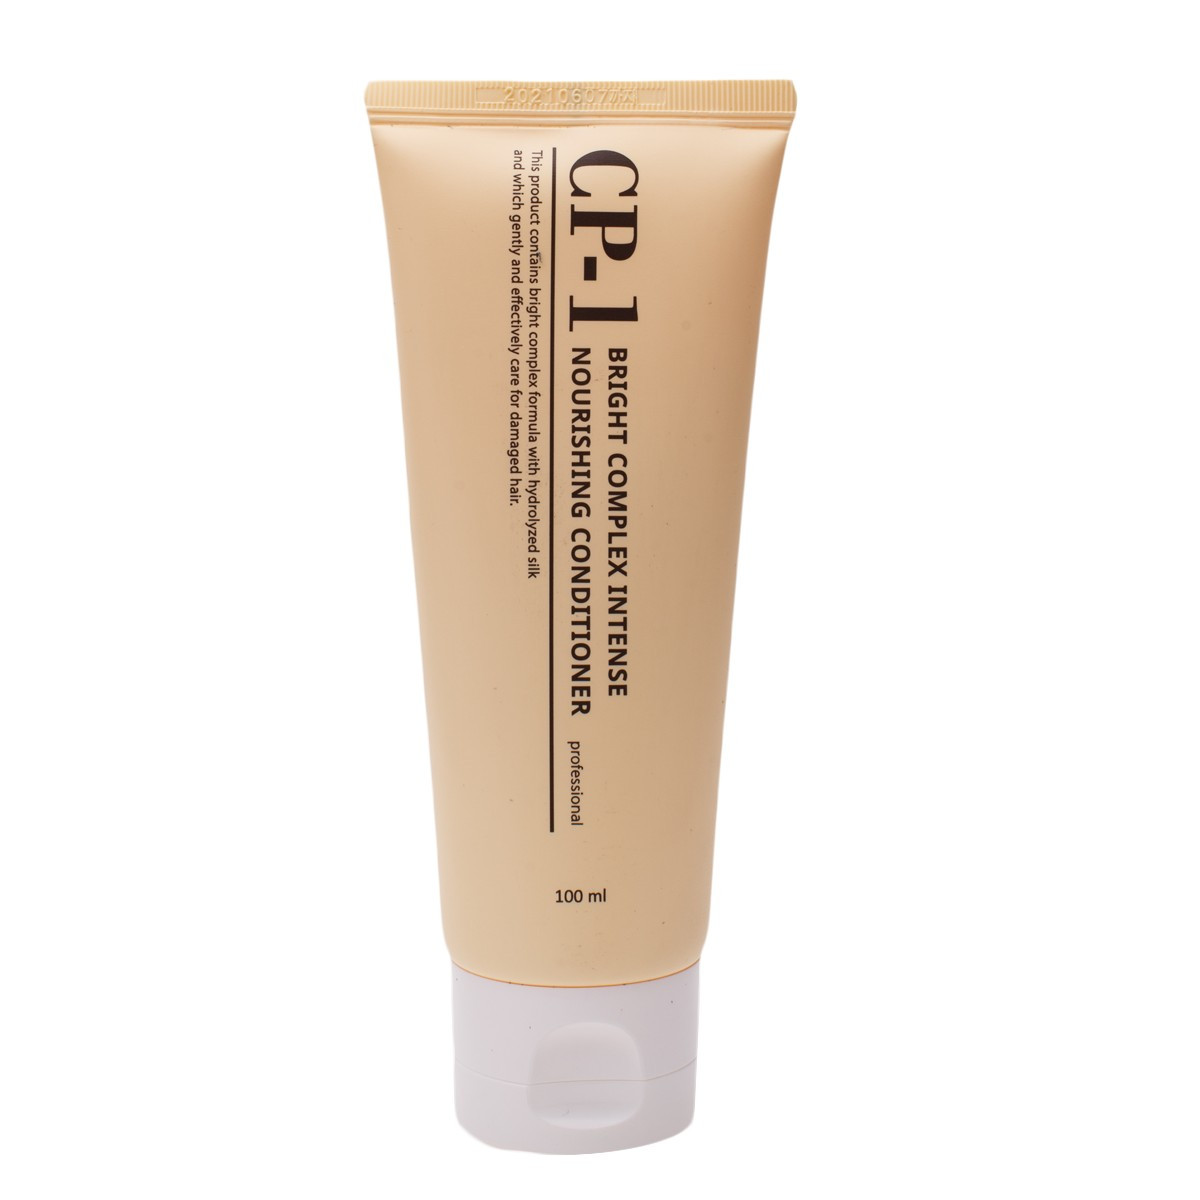 CP-1 Bright Complex Intense Nourishing Conditioner Інтенсивно зволожуючий кондиціонер для волосся, 100 мл